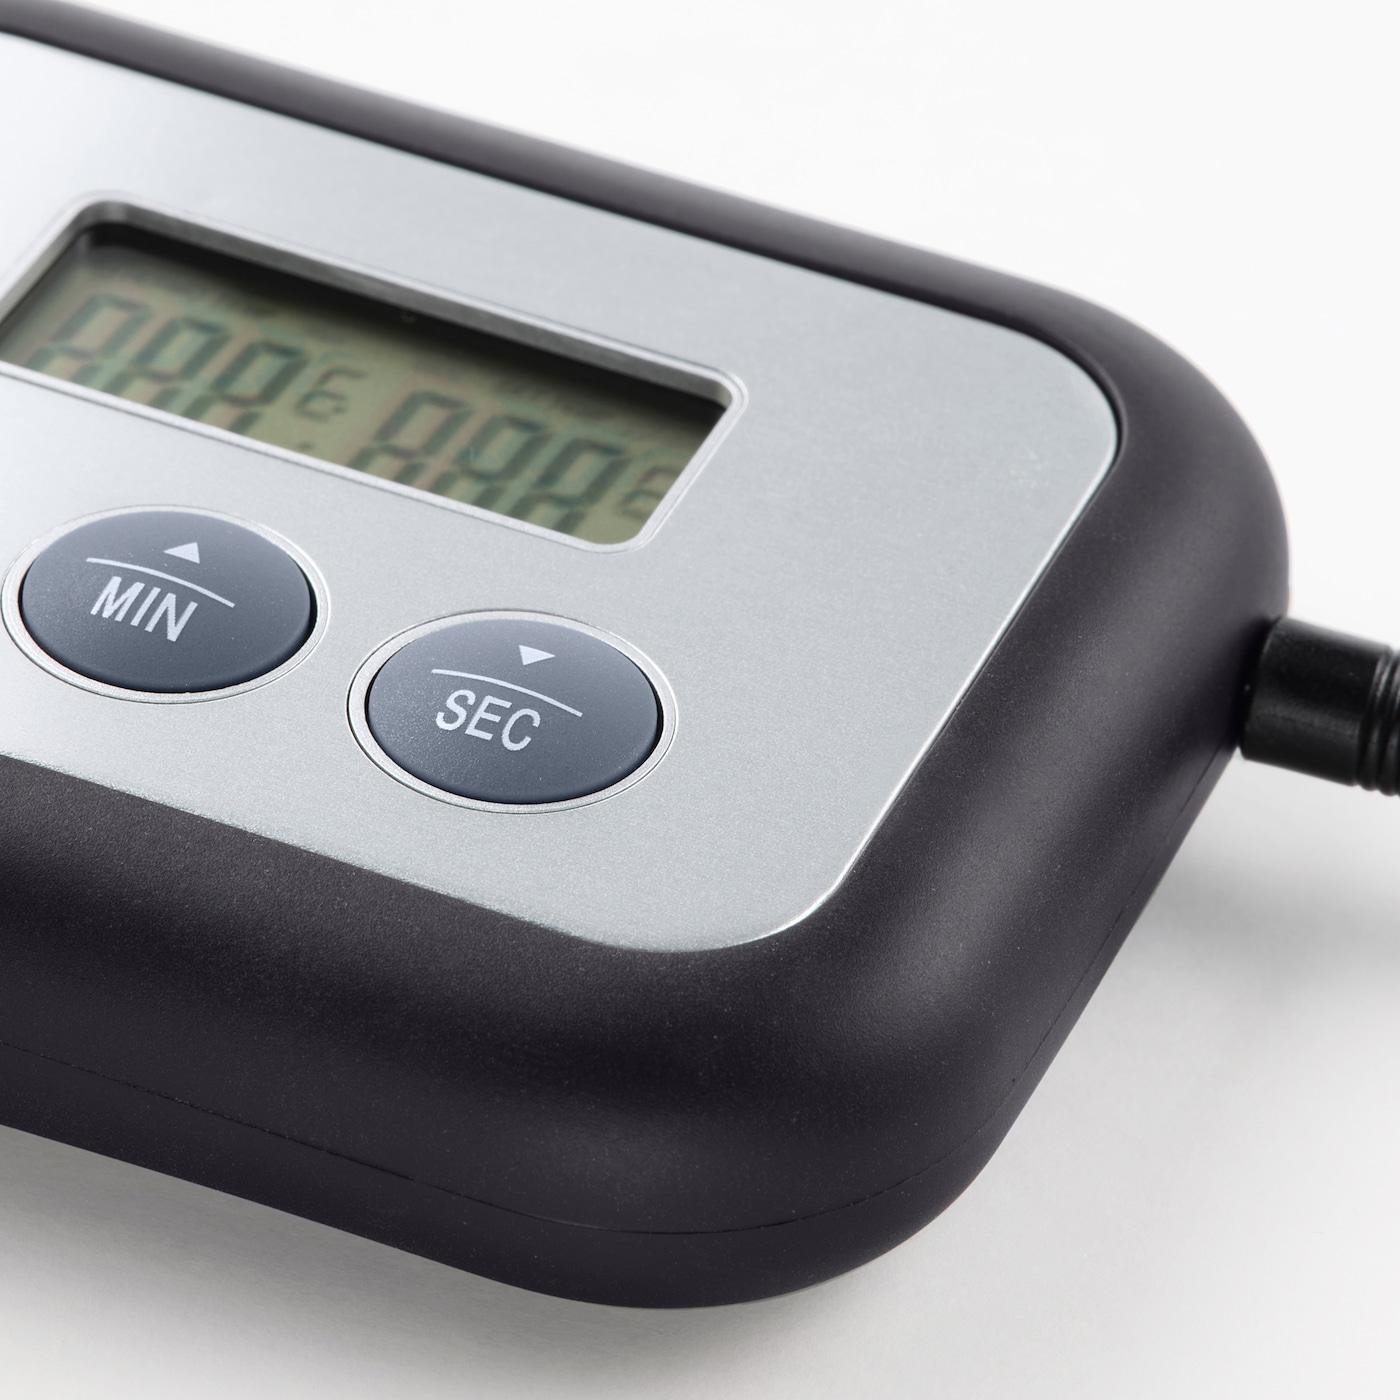 FANTAST Meat thermometertimer digital black IKEA